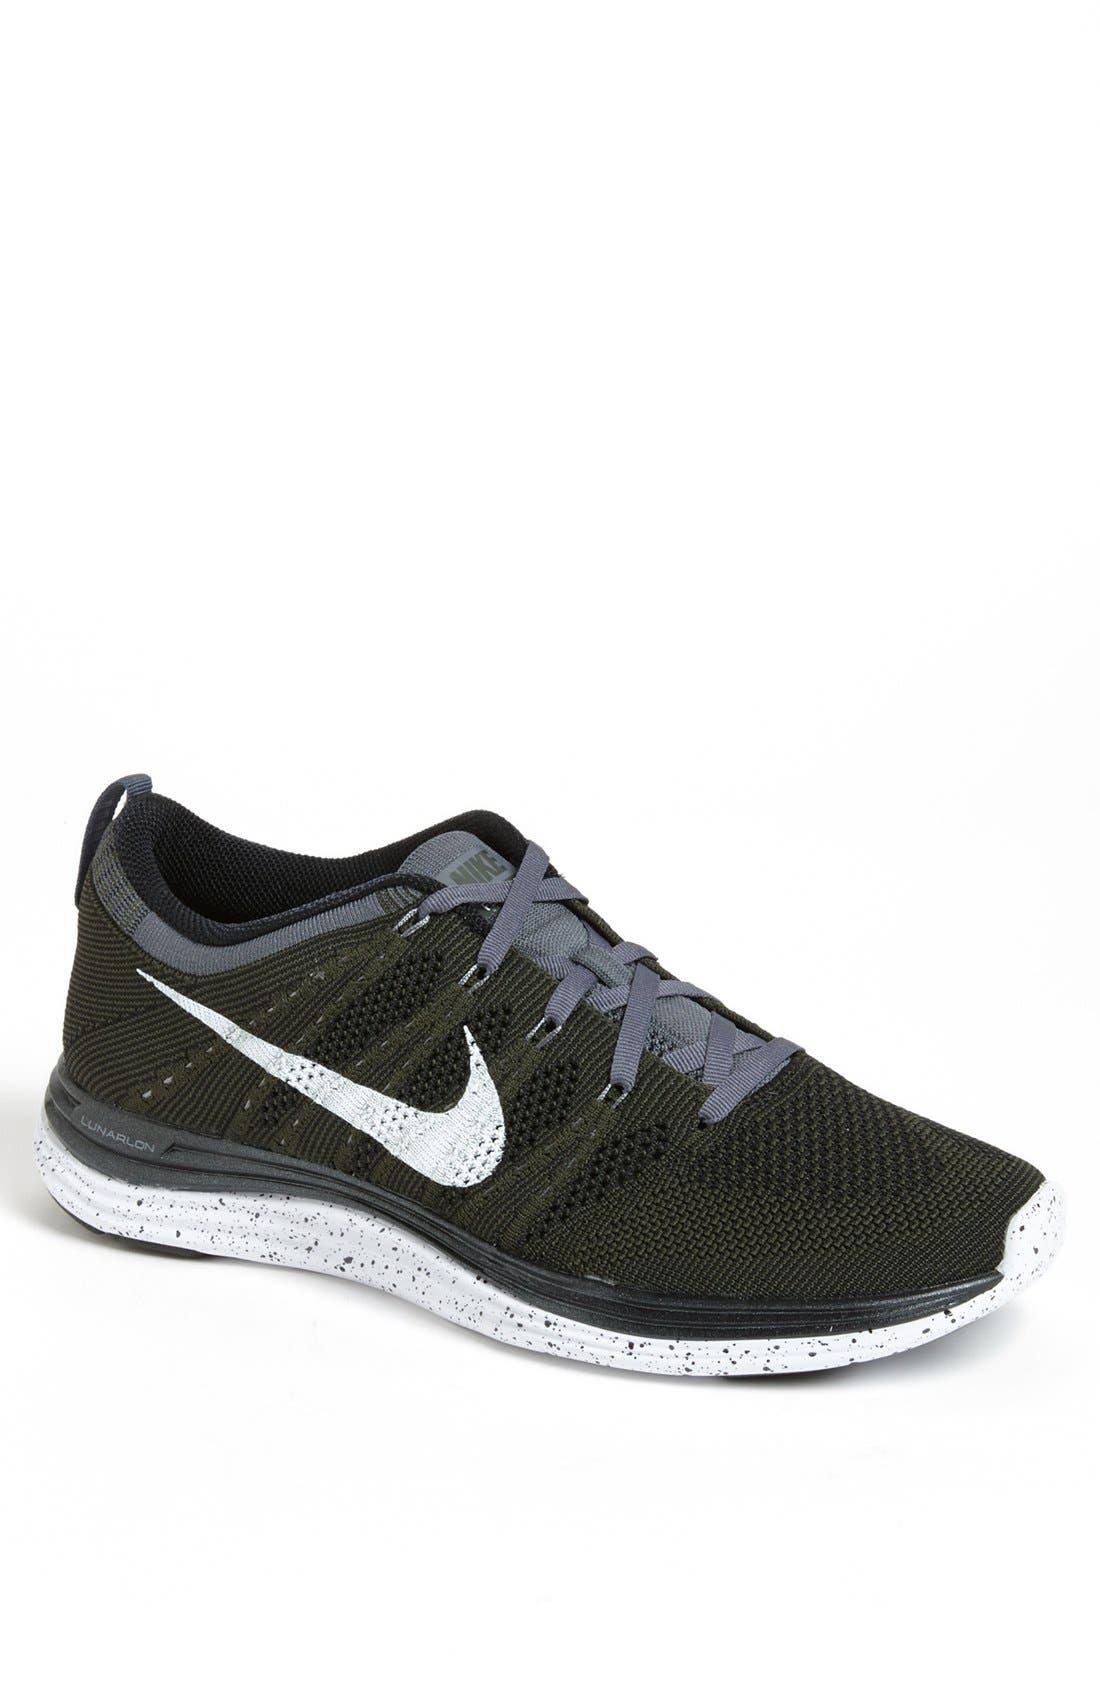 Main Image - Nike 'Flyknit Lunar1+' Running Shoe (Men)